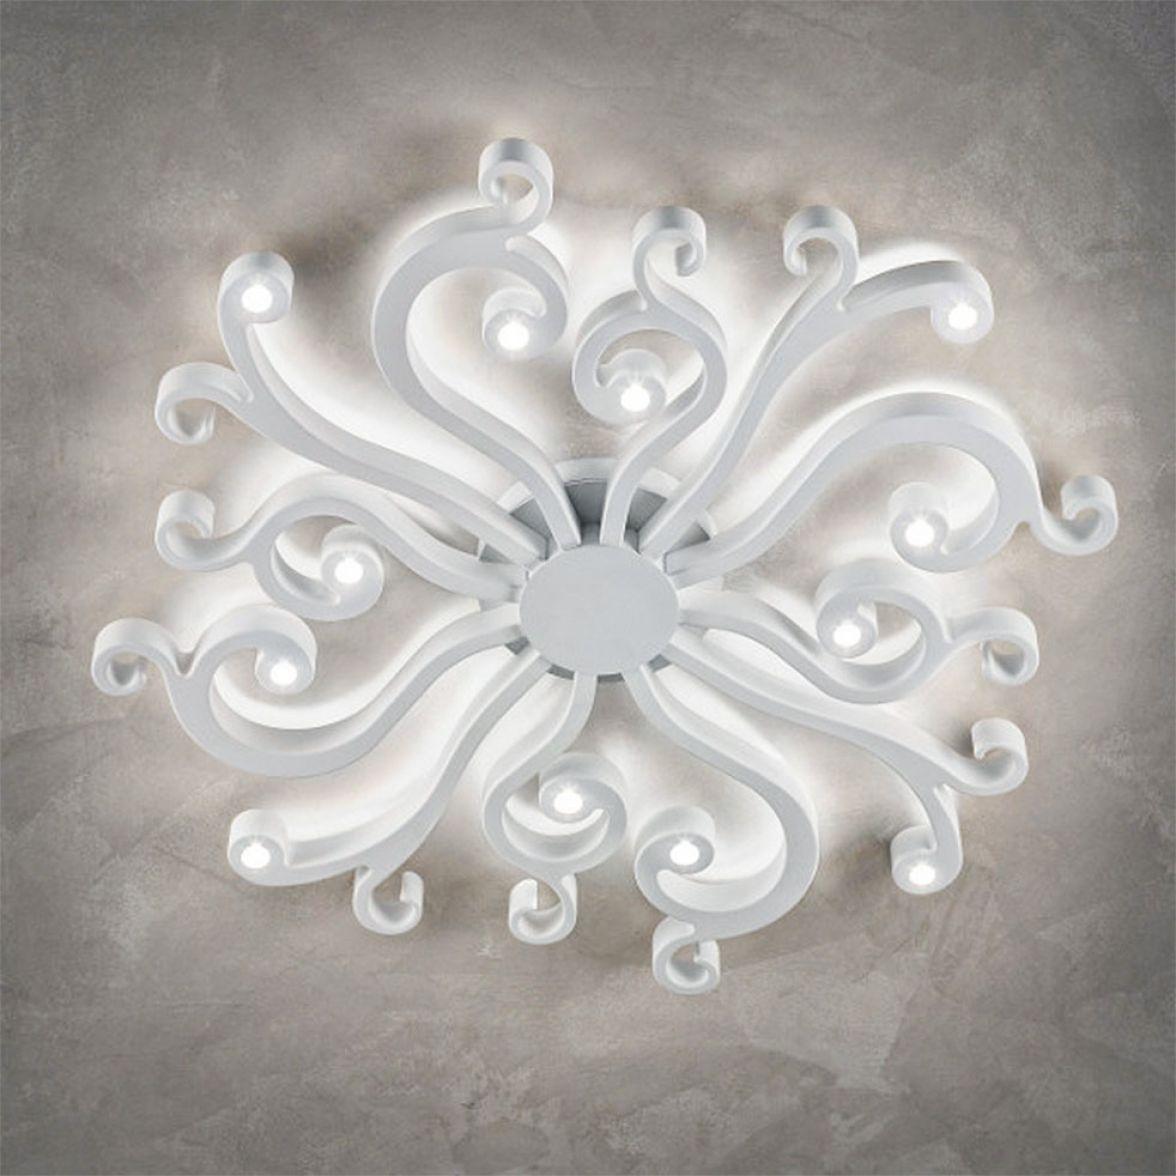 Virgo lamp фото цена